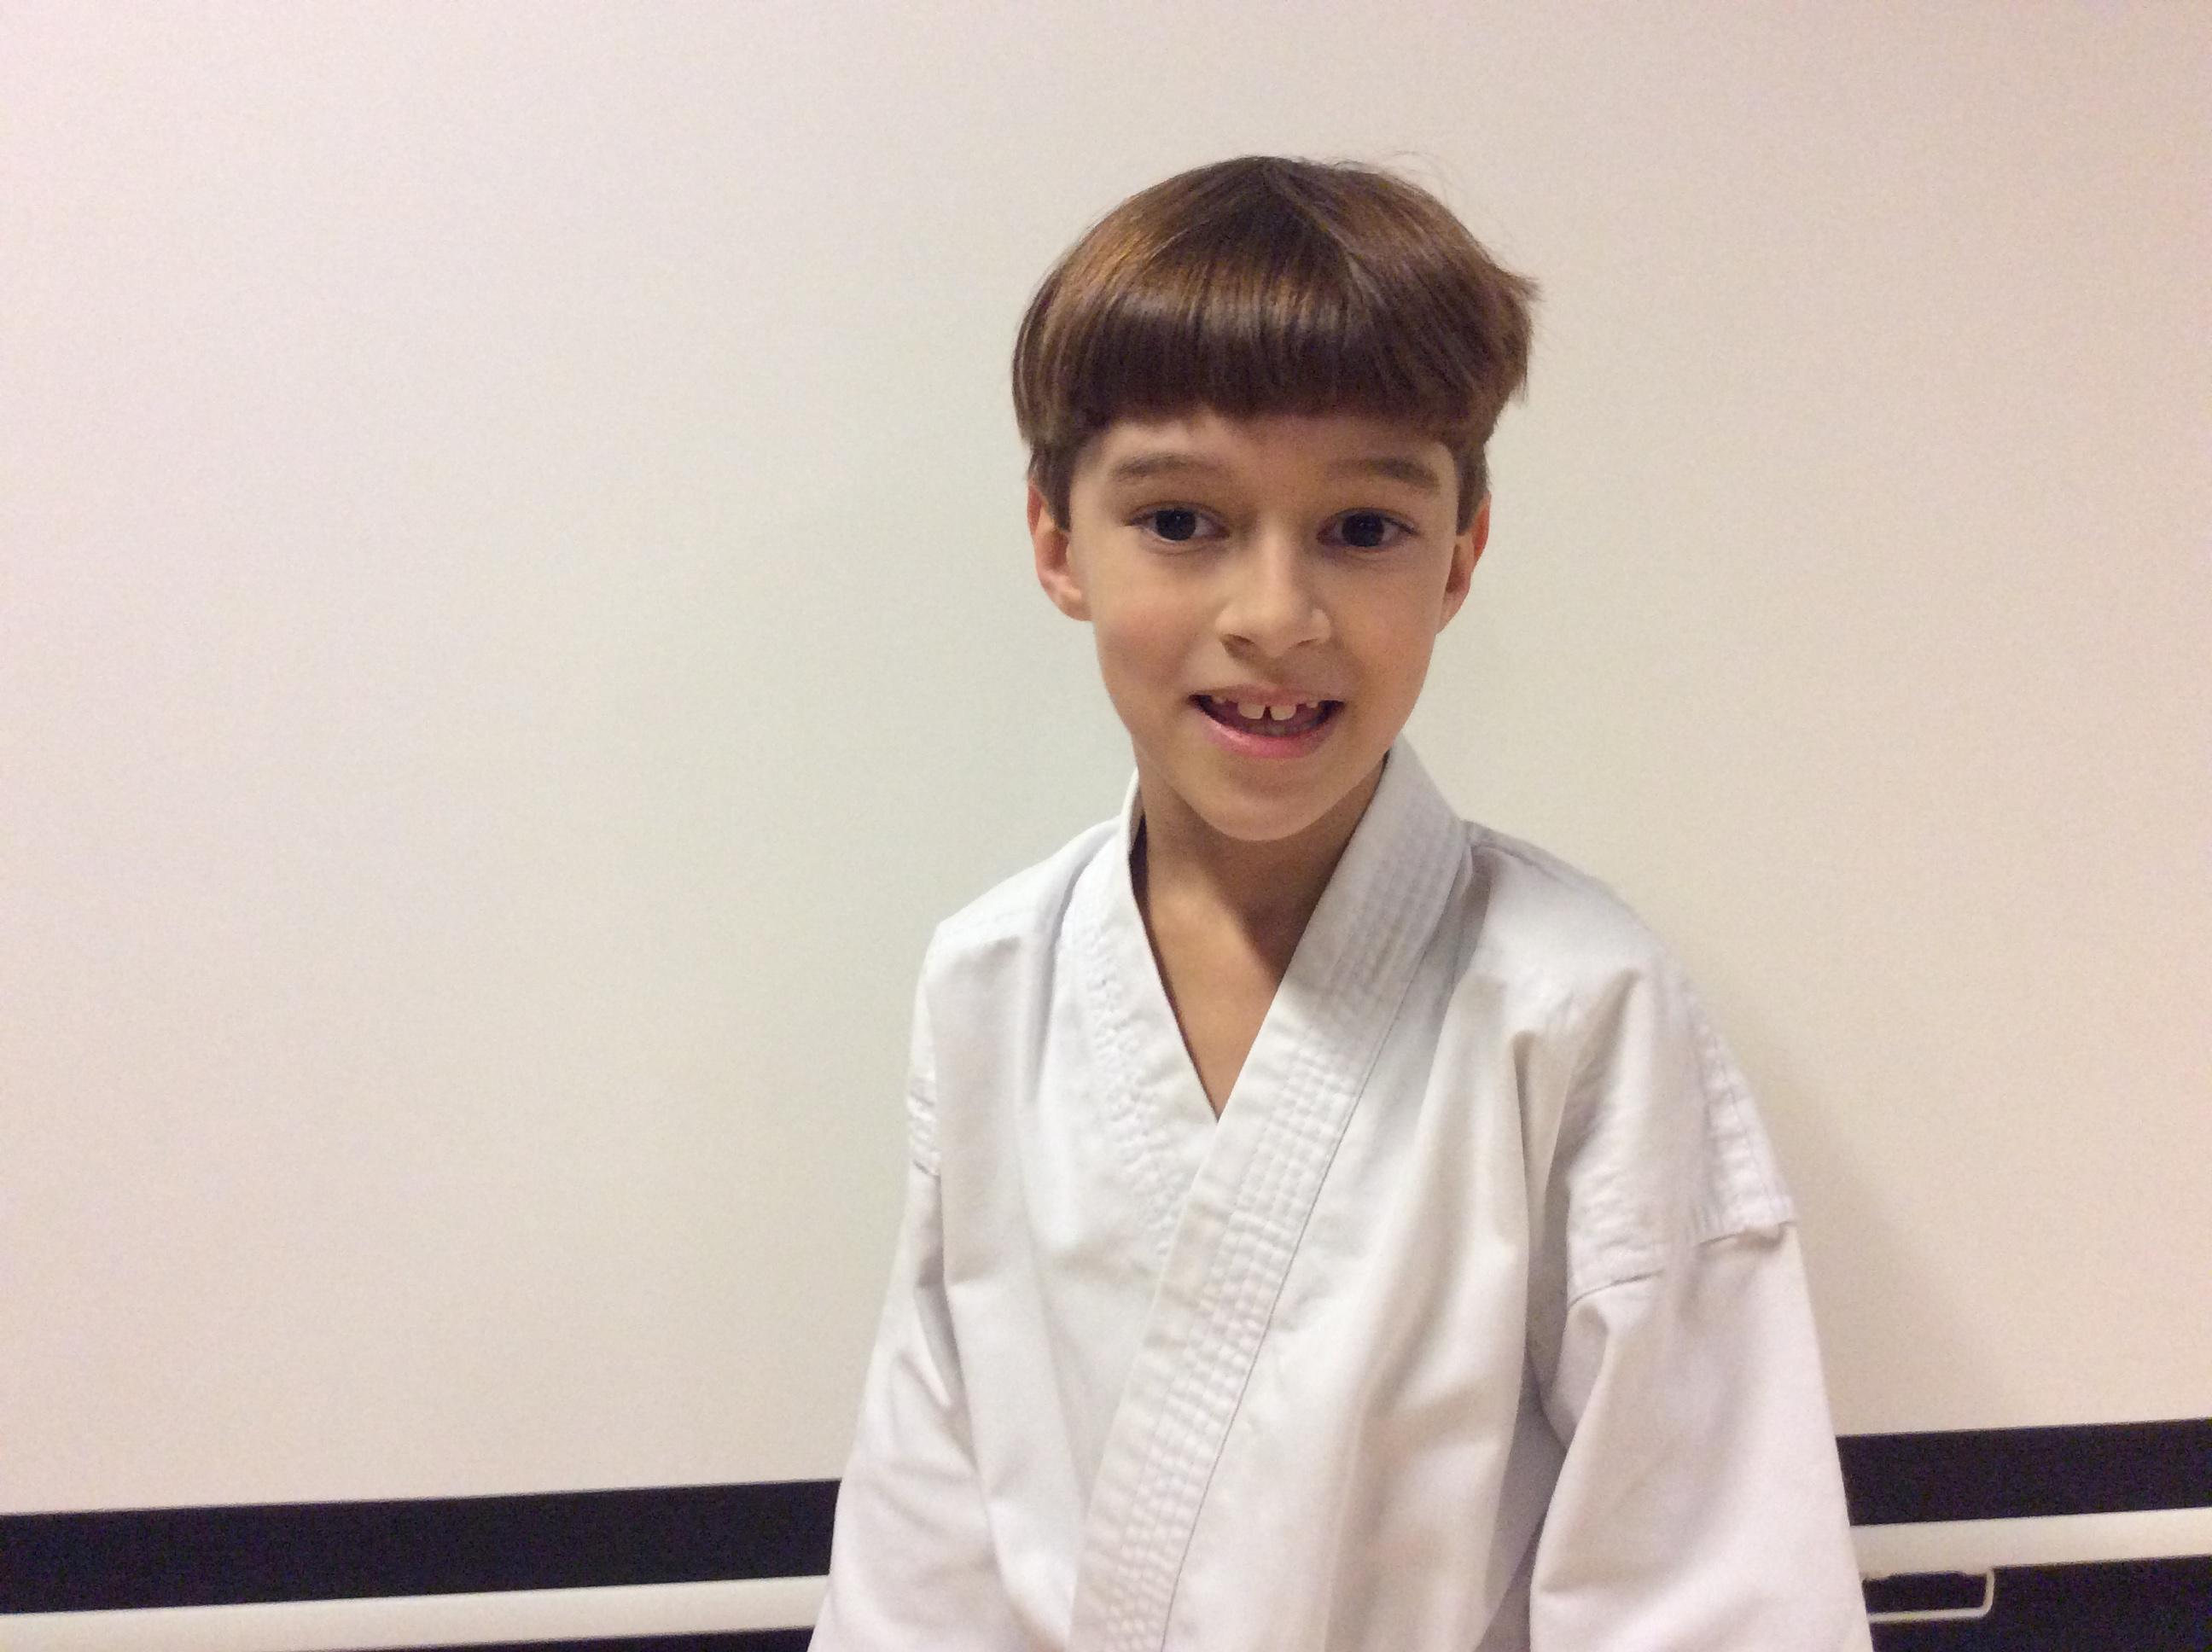 Kevin, karateleerling bij Kaihatsu